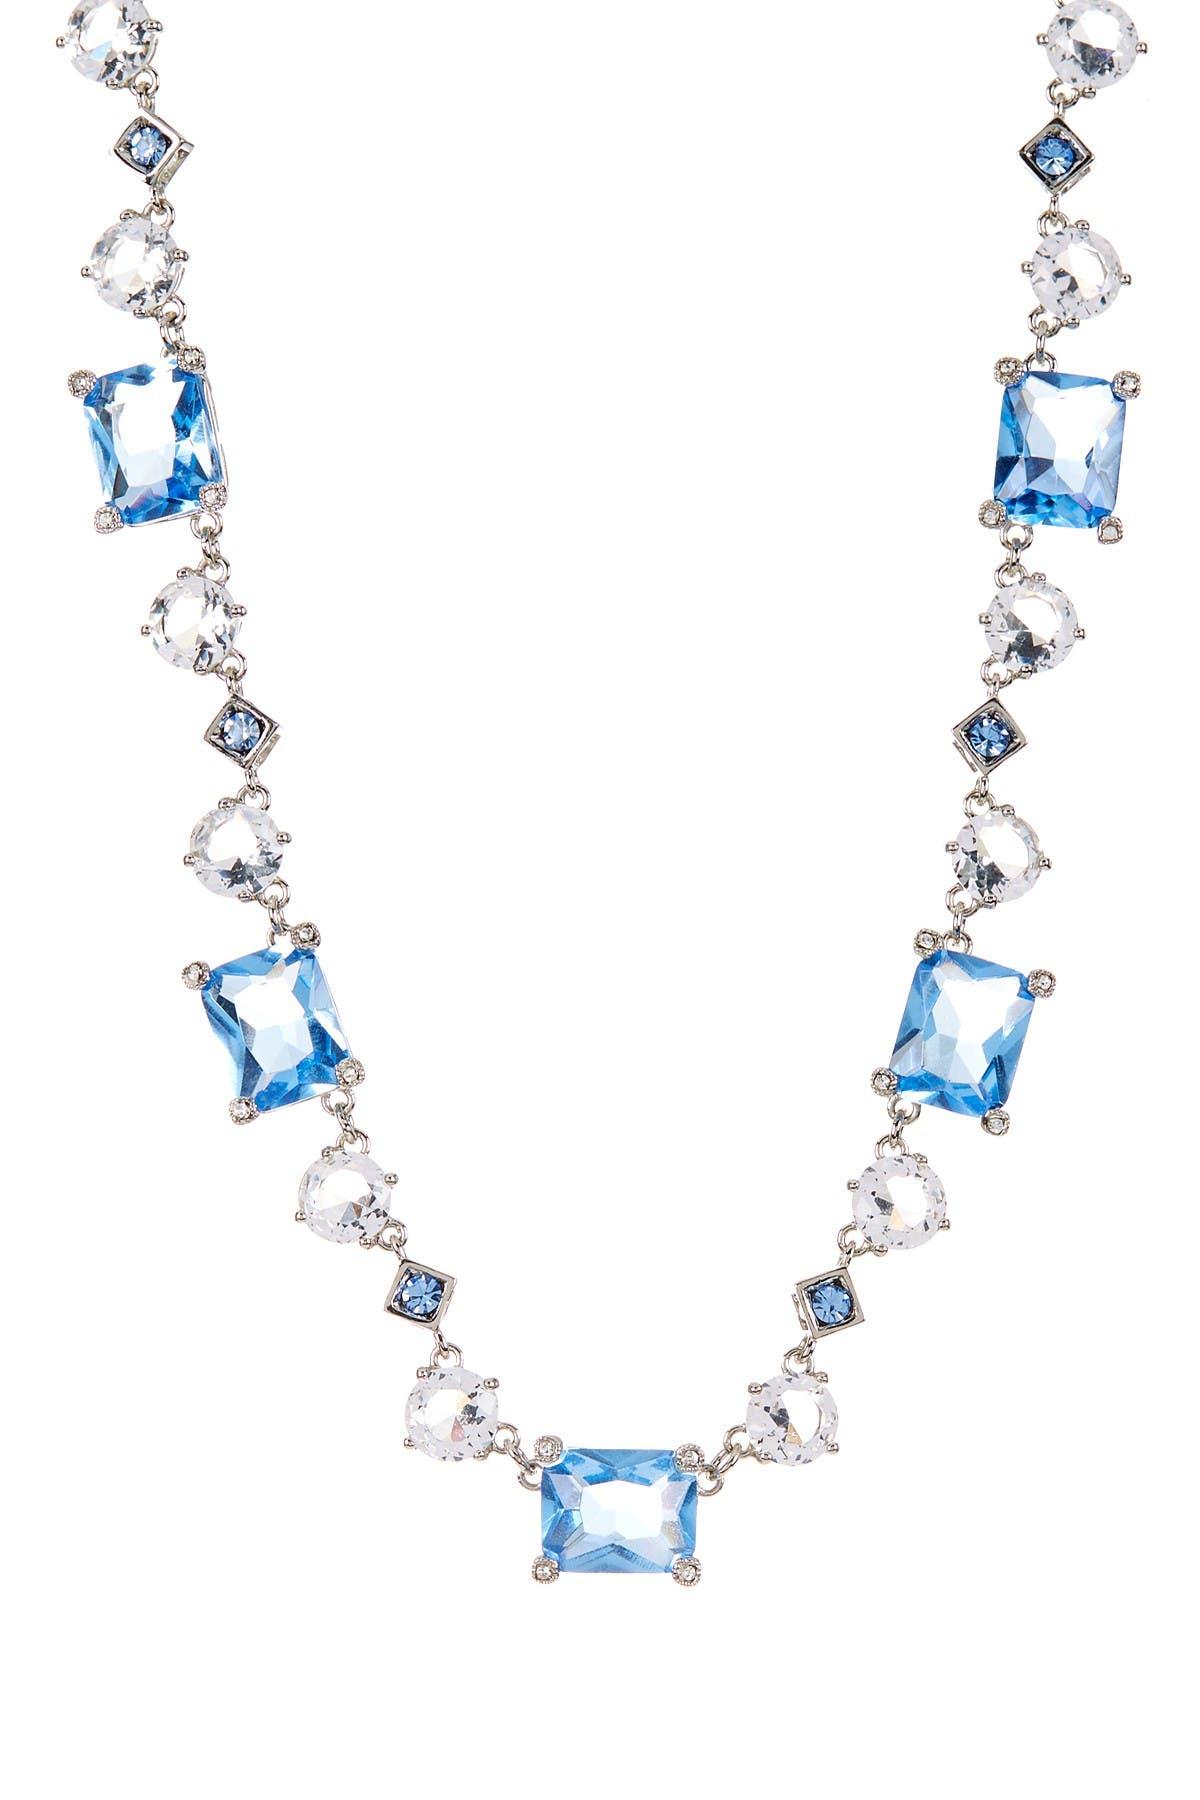 Image of Carolee Newport Nouveau Blue & White Station Necklace